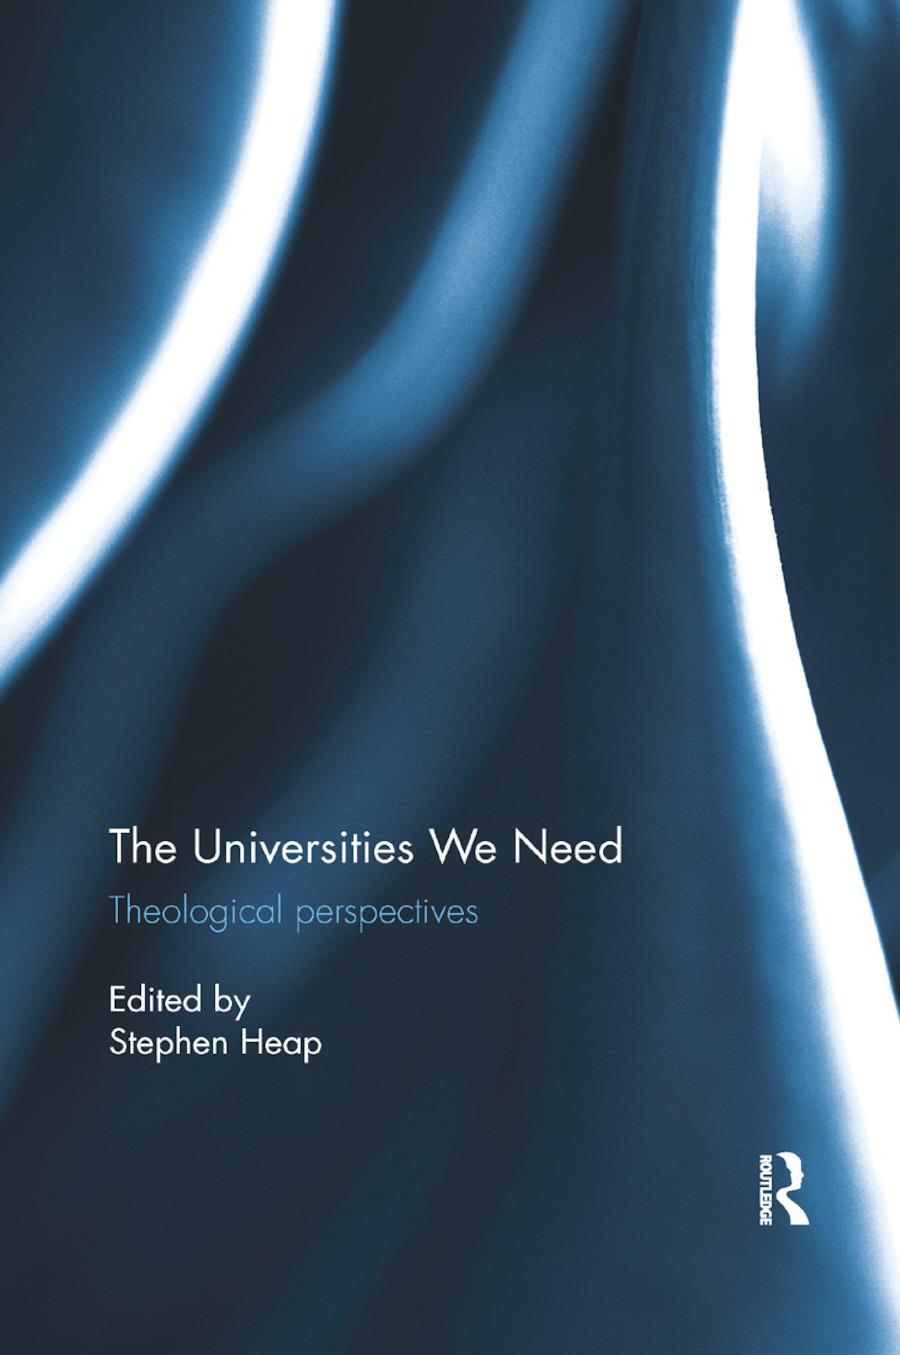 The Universities We Need